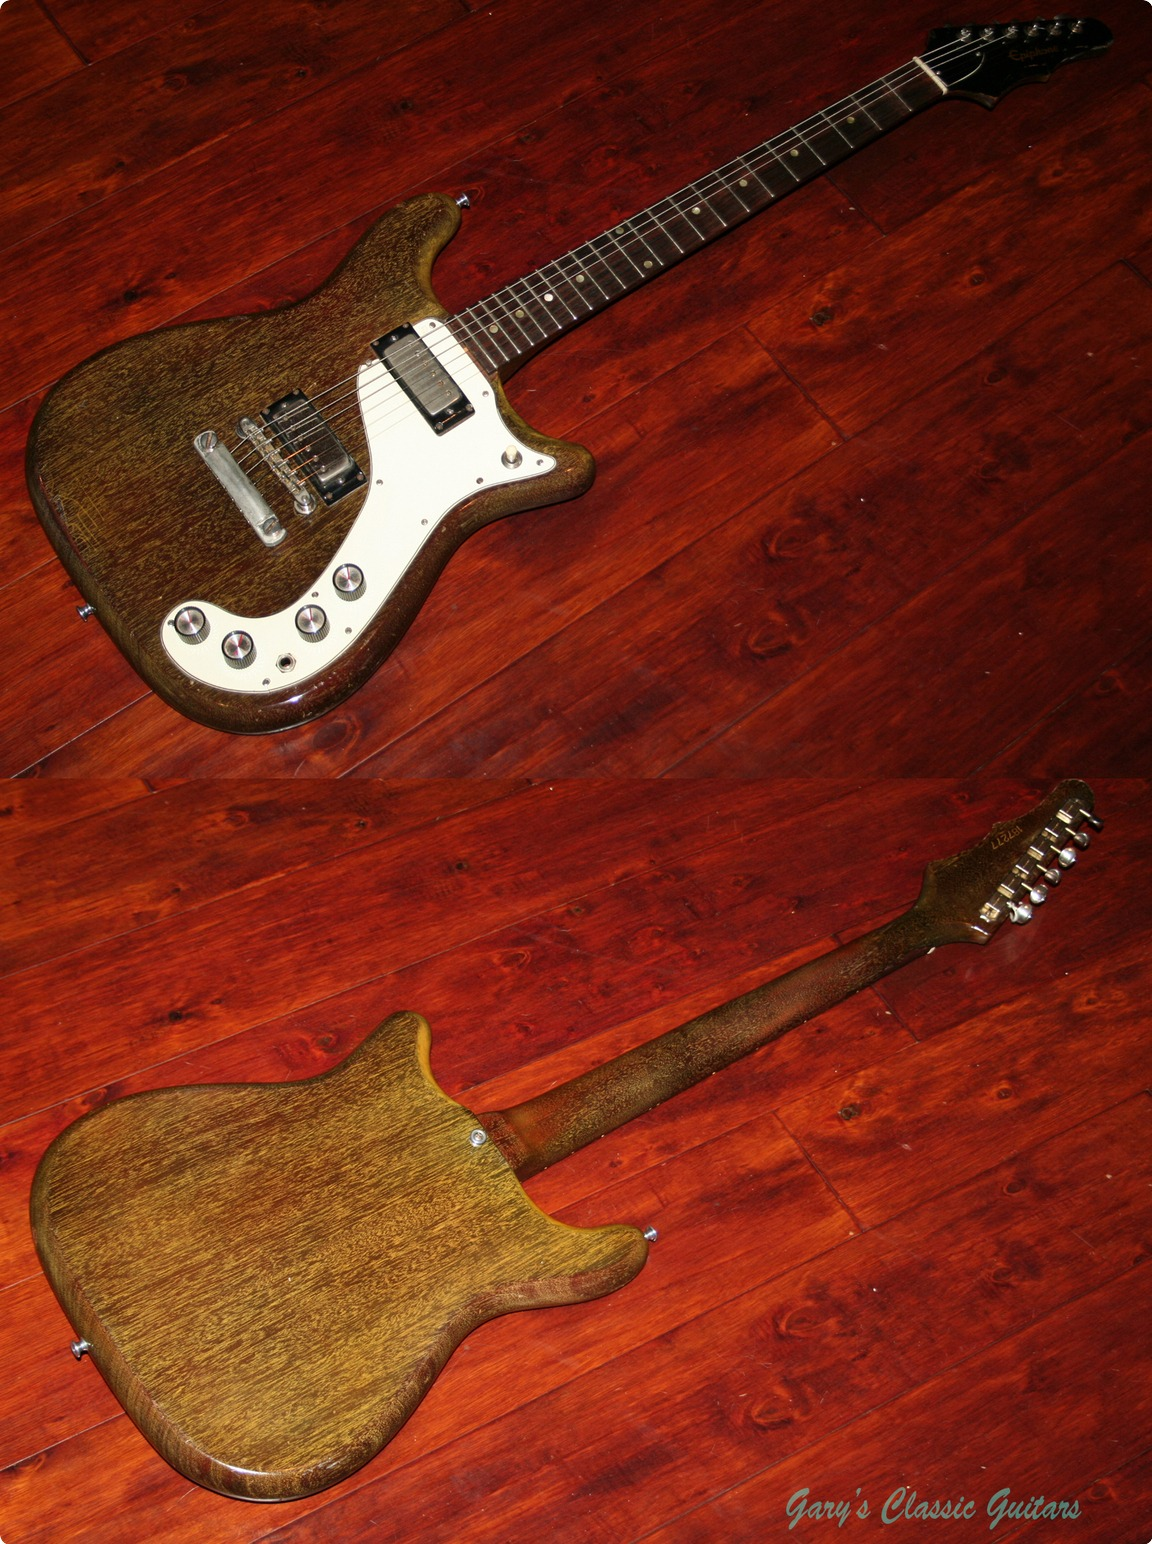 epiphone wilshire epe0231 1964 guitar for sale garys classic guitars. Black Bedroom Furniture Sets. Home Design Ideas